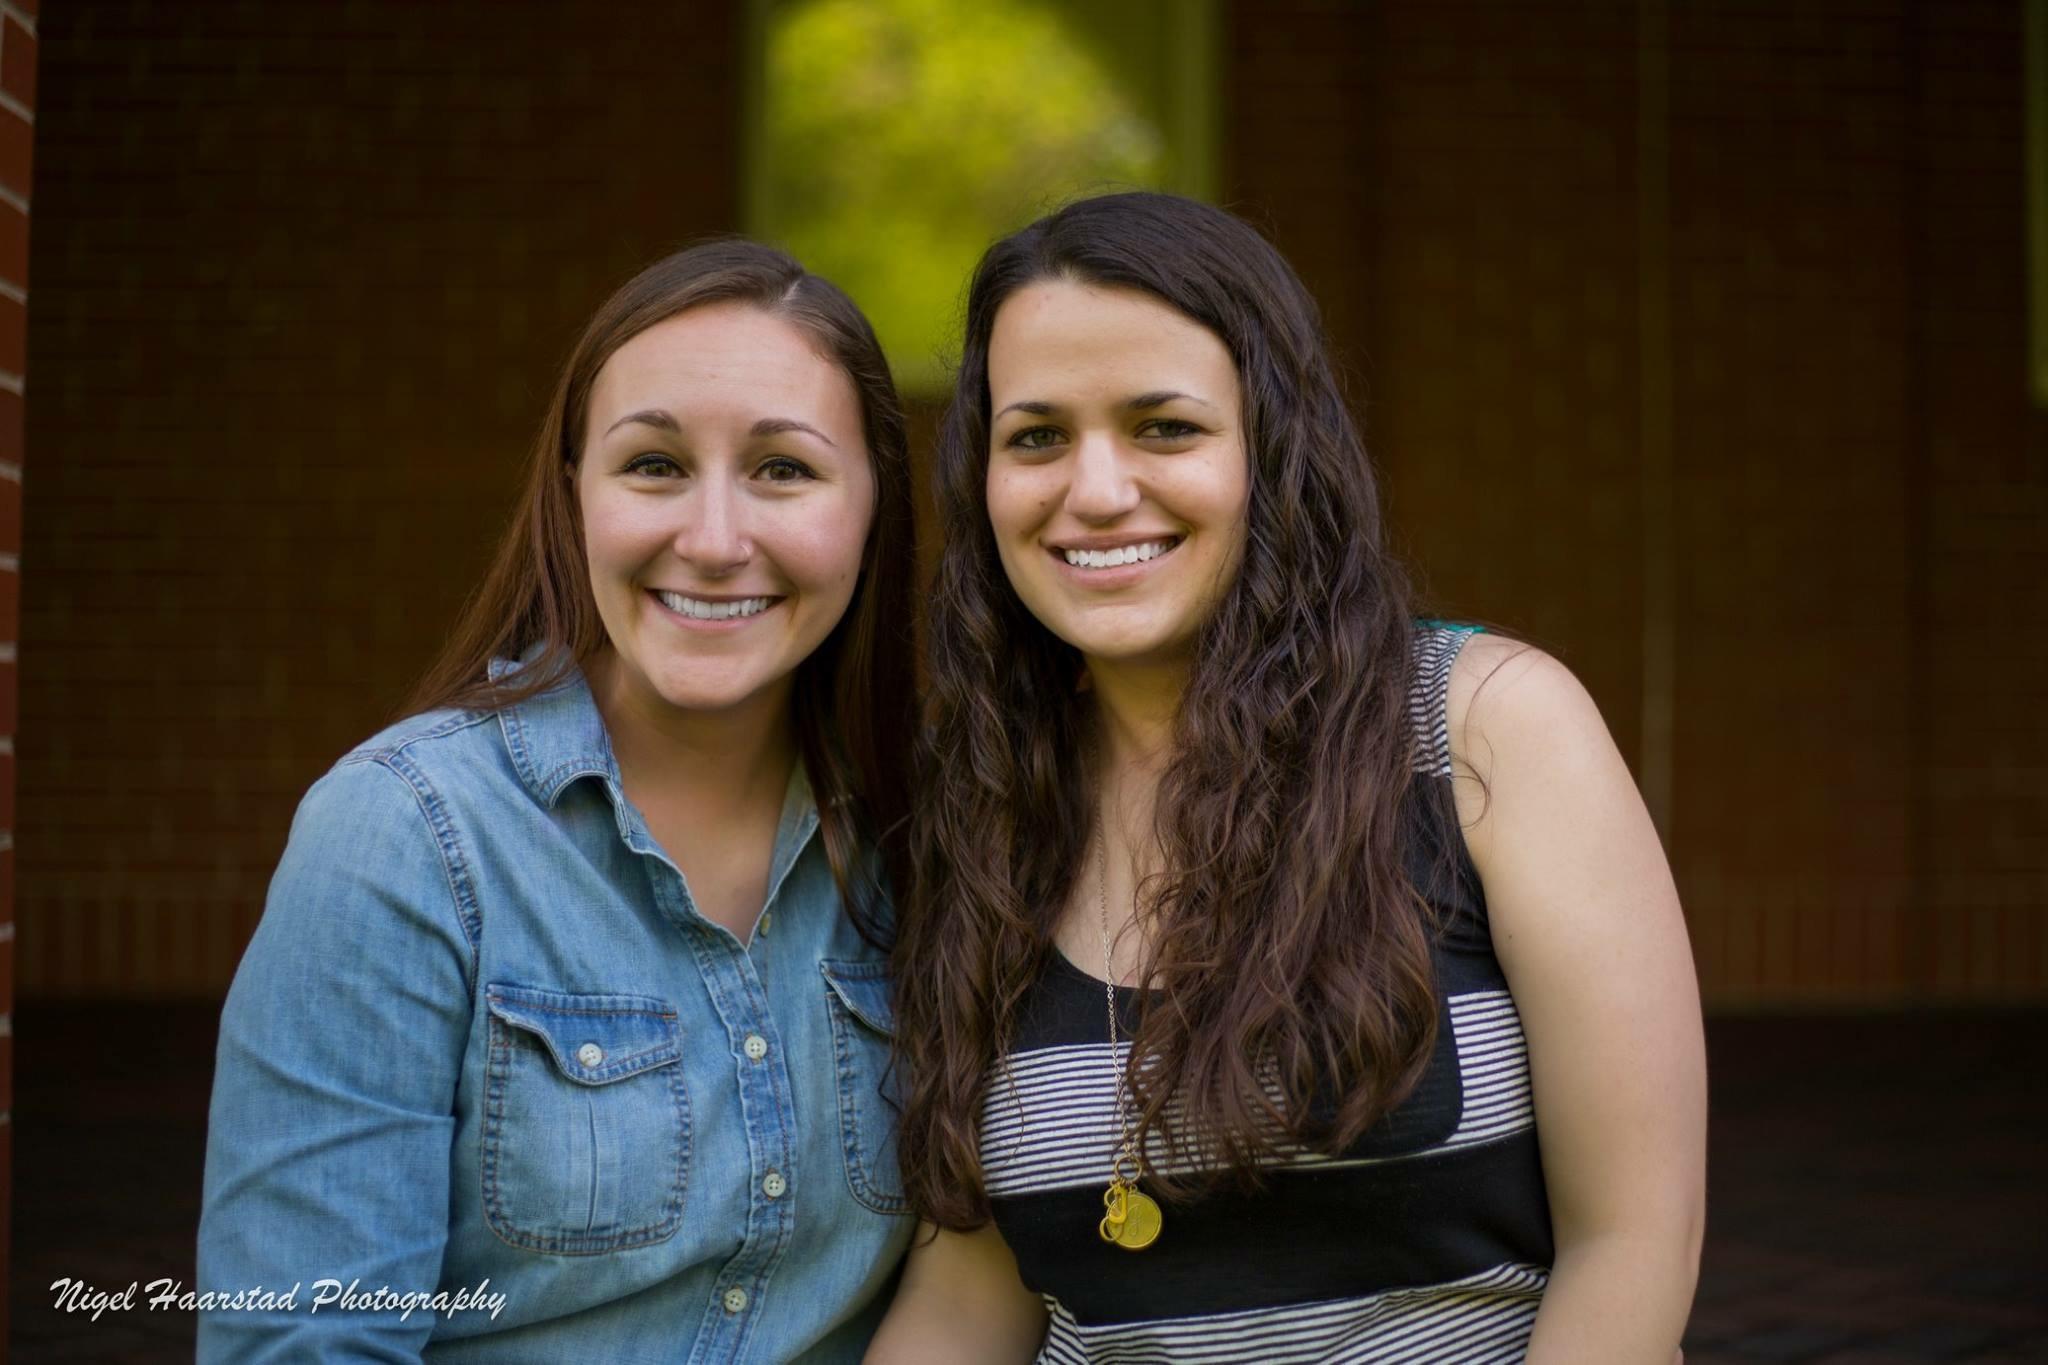 Image 3 of Emily and Jordan